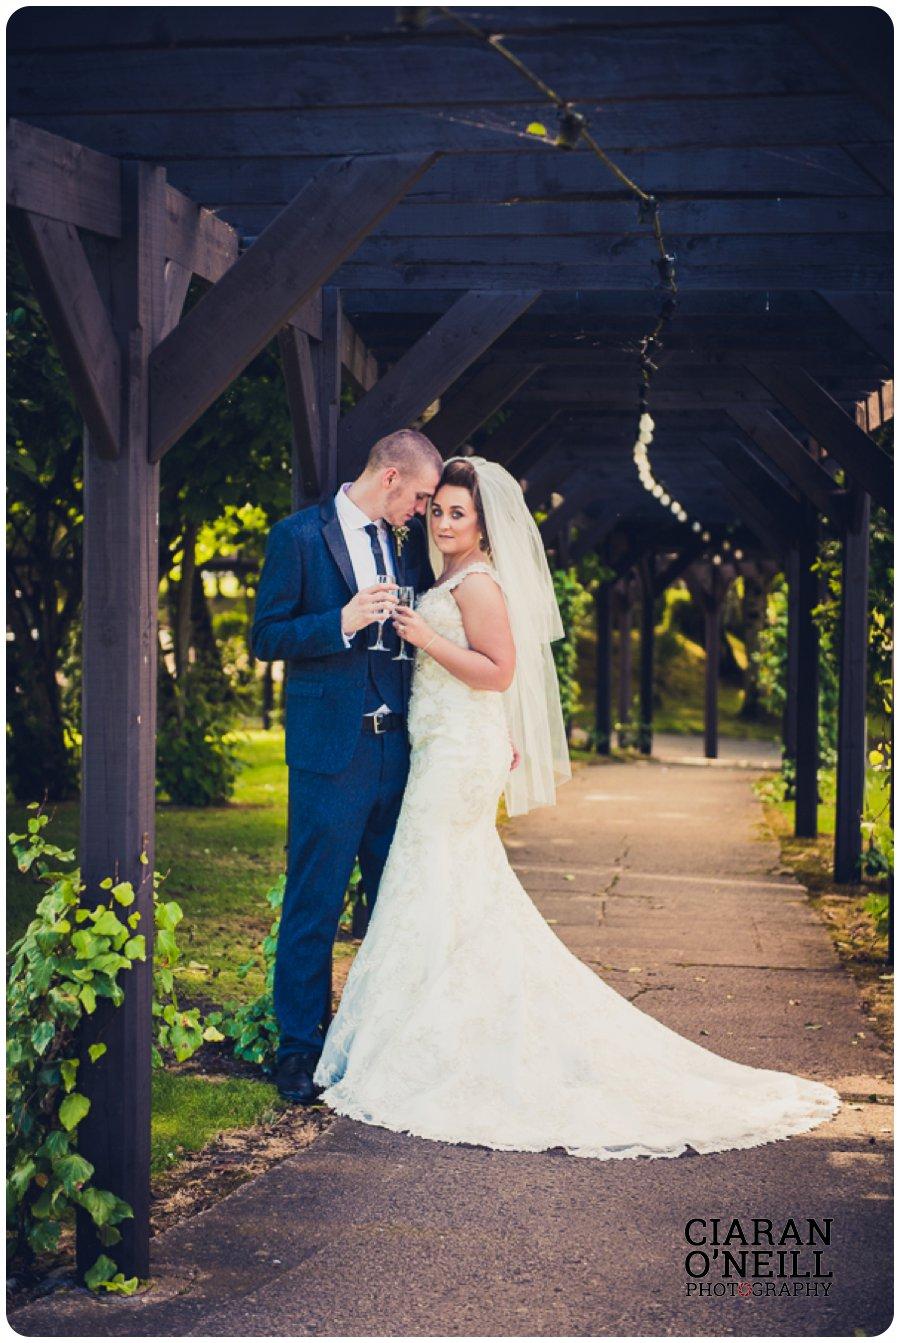 Amy & Tyler's wedding at Lusty Beg Island by Ciaran O'Neill Photography 10